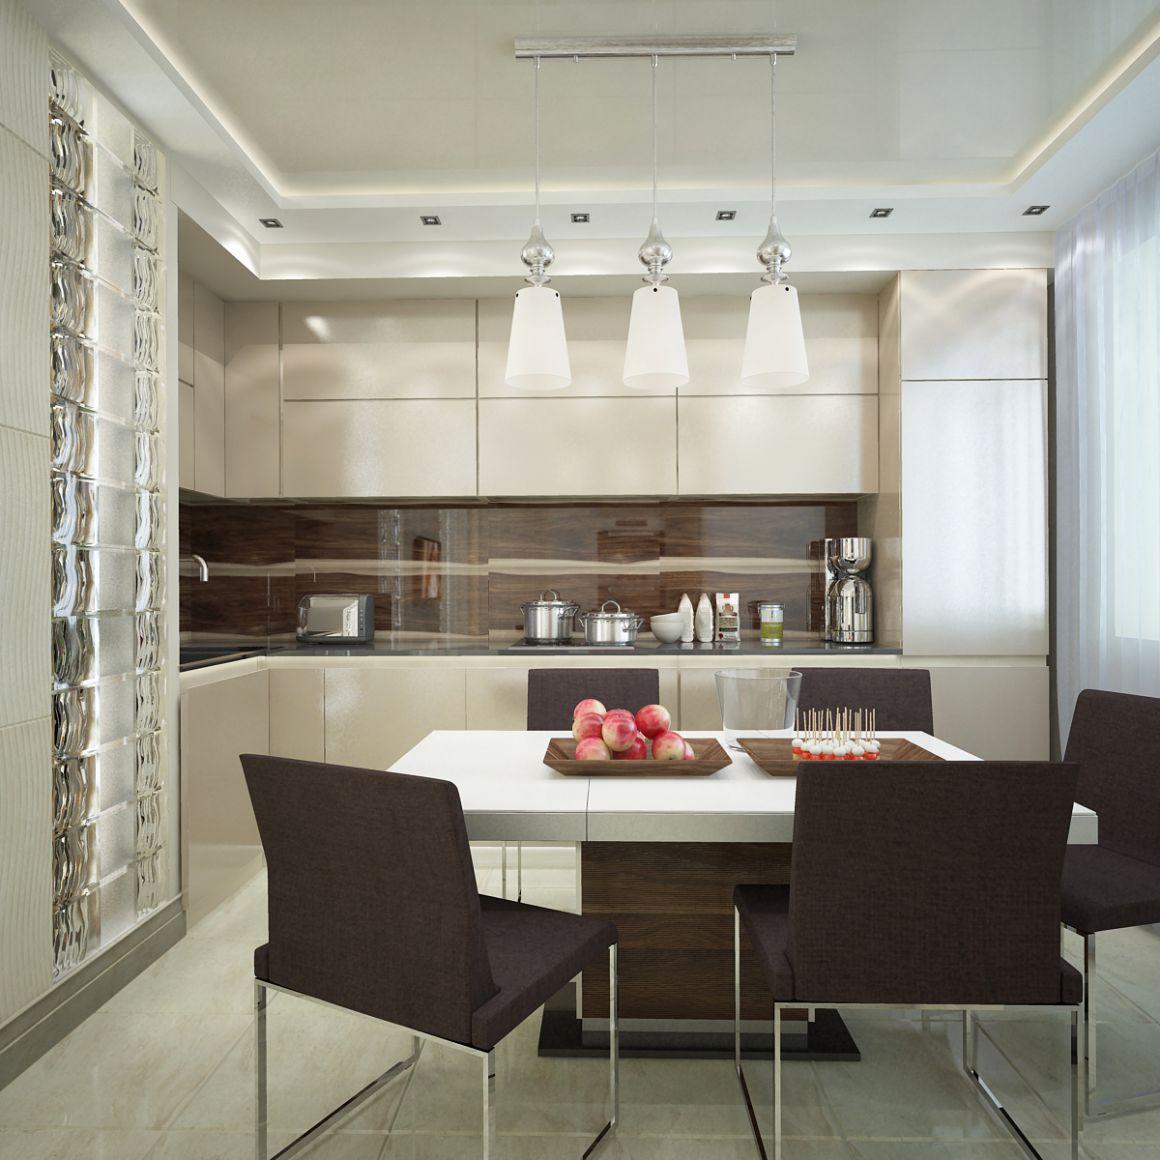 Дизайн проект 2-х комнатной квартиры для четырех человек